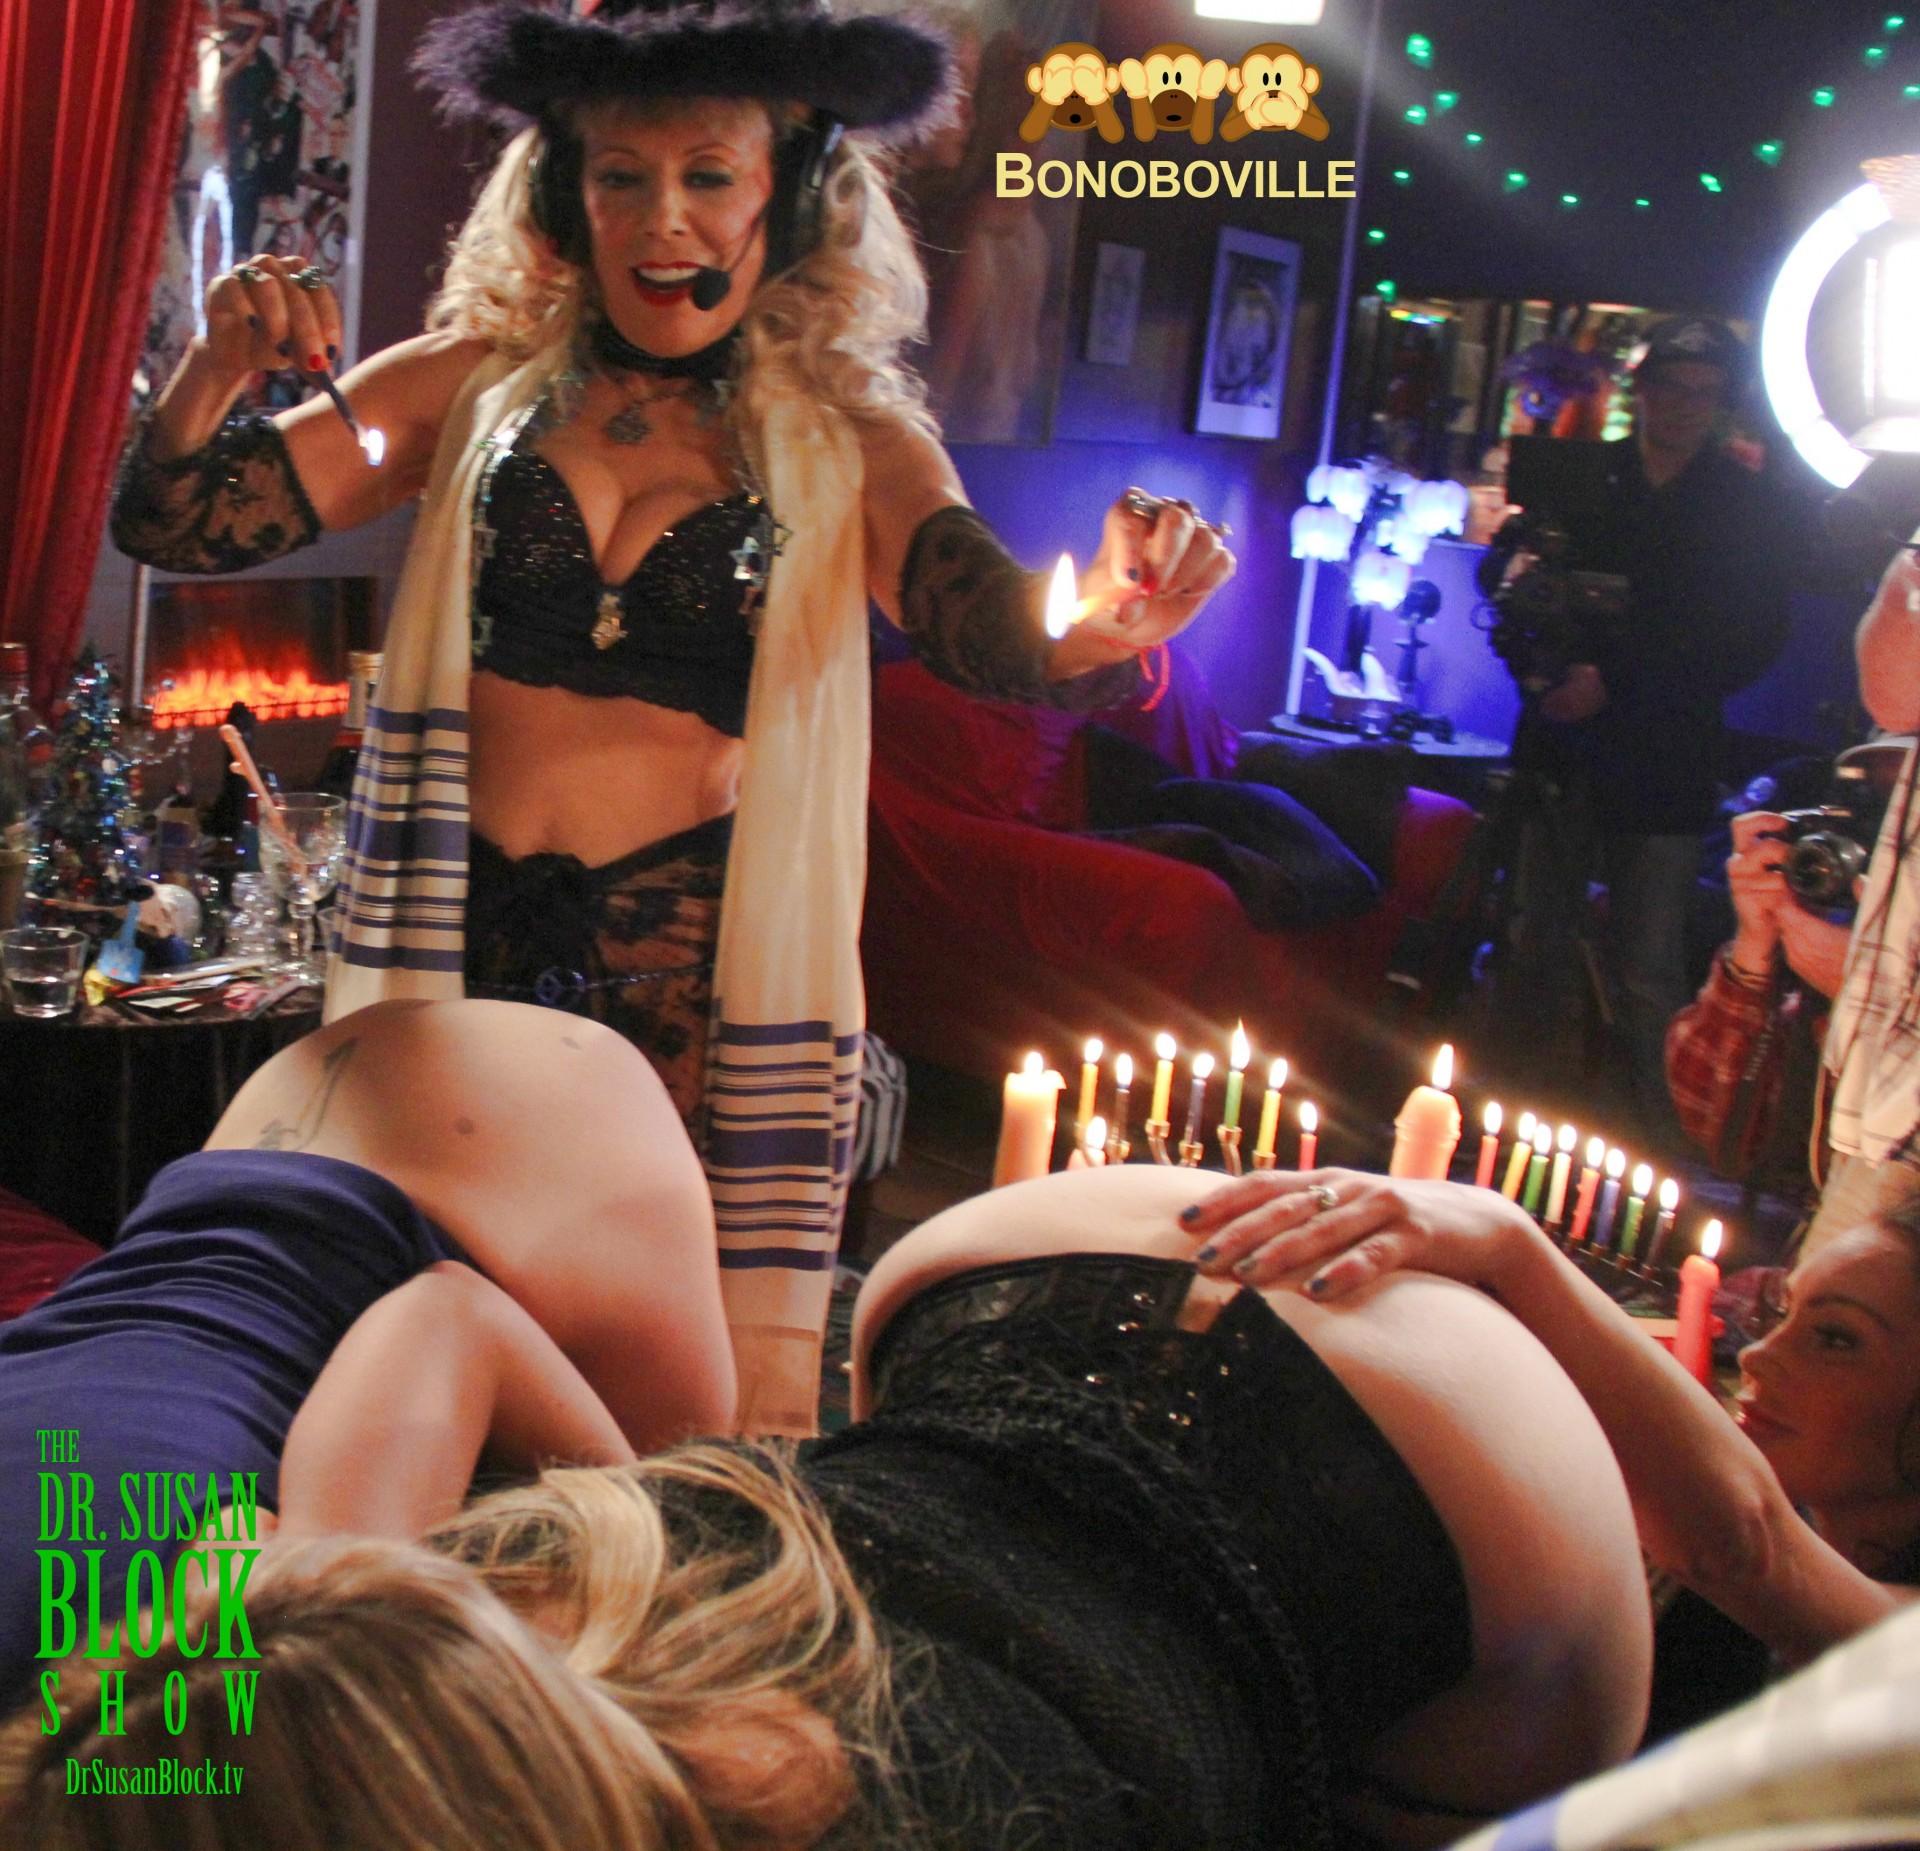 Hot Wax Hanukkah in Bonoboville